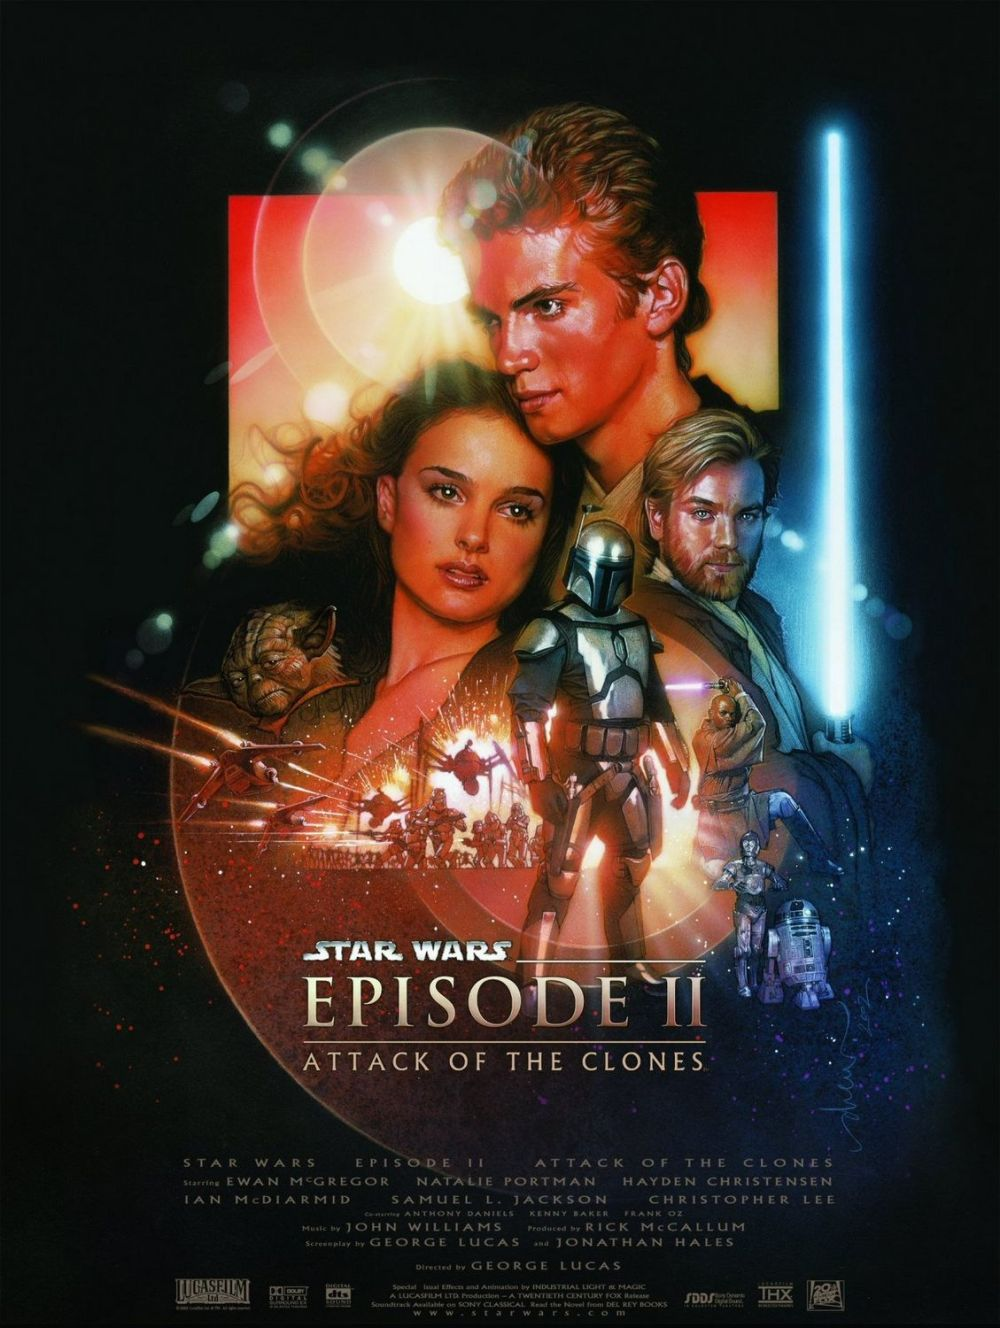 Star Wars: Episode II - Attack of the Clones (2002, 20th Century Fox)